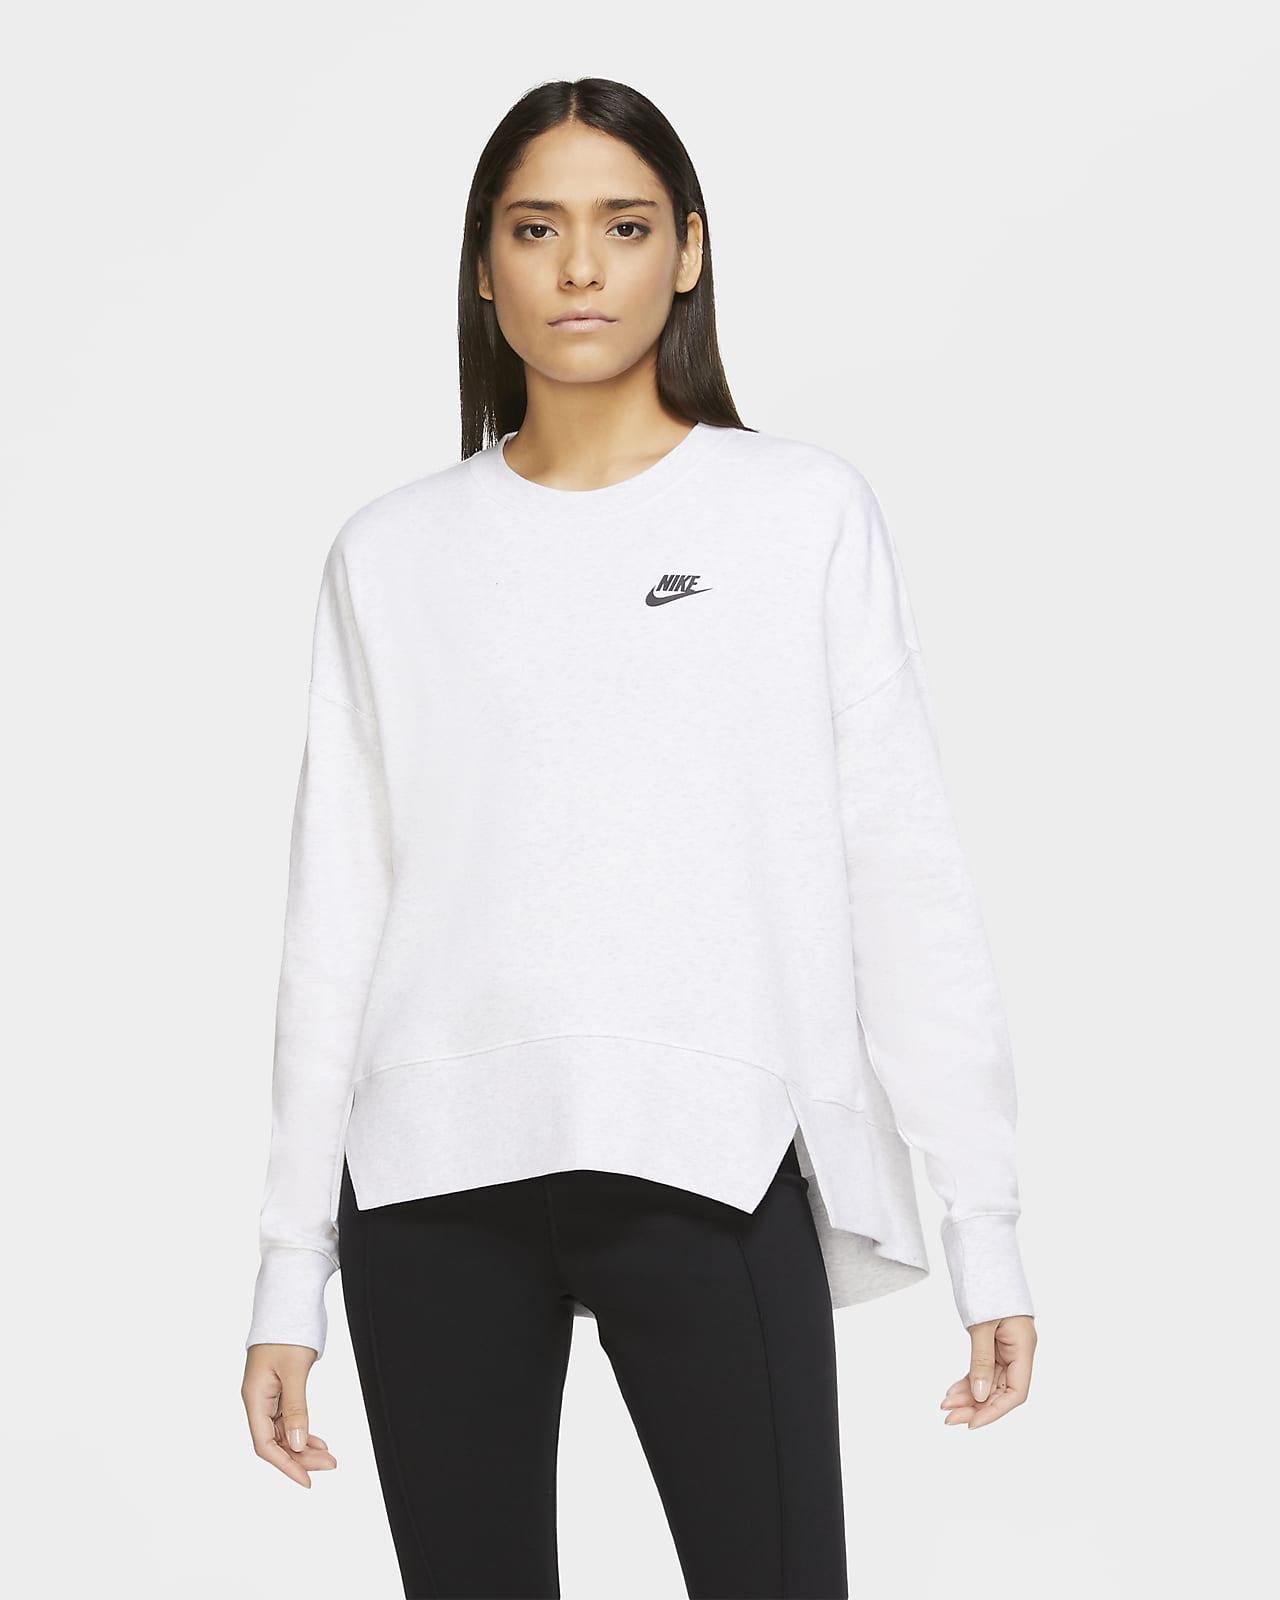 formal Ilegible Espectador  Nike Sportswear Club Women's Fleece Crew. Nike.com